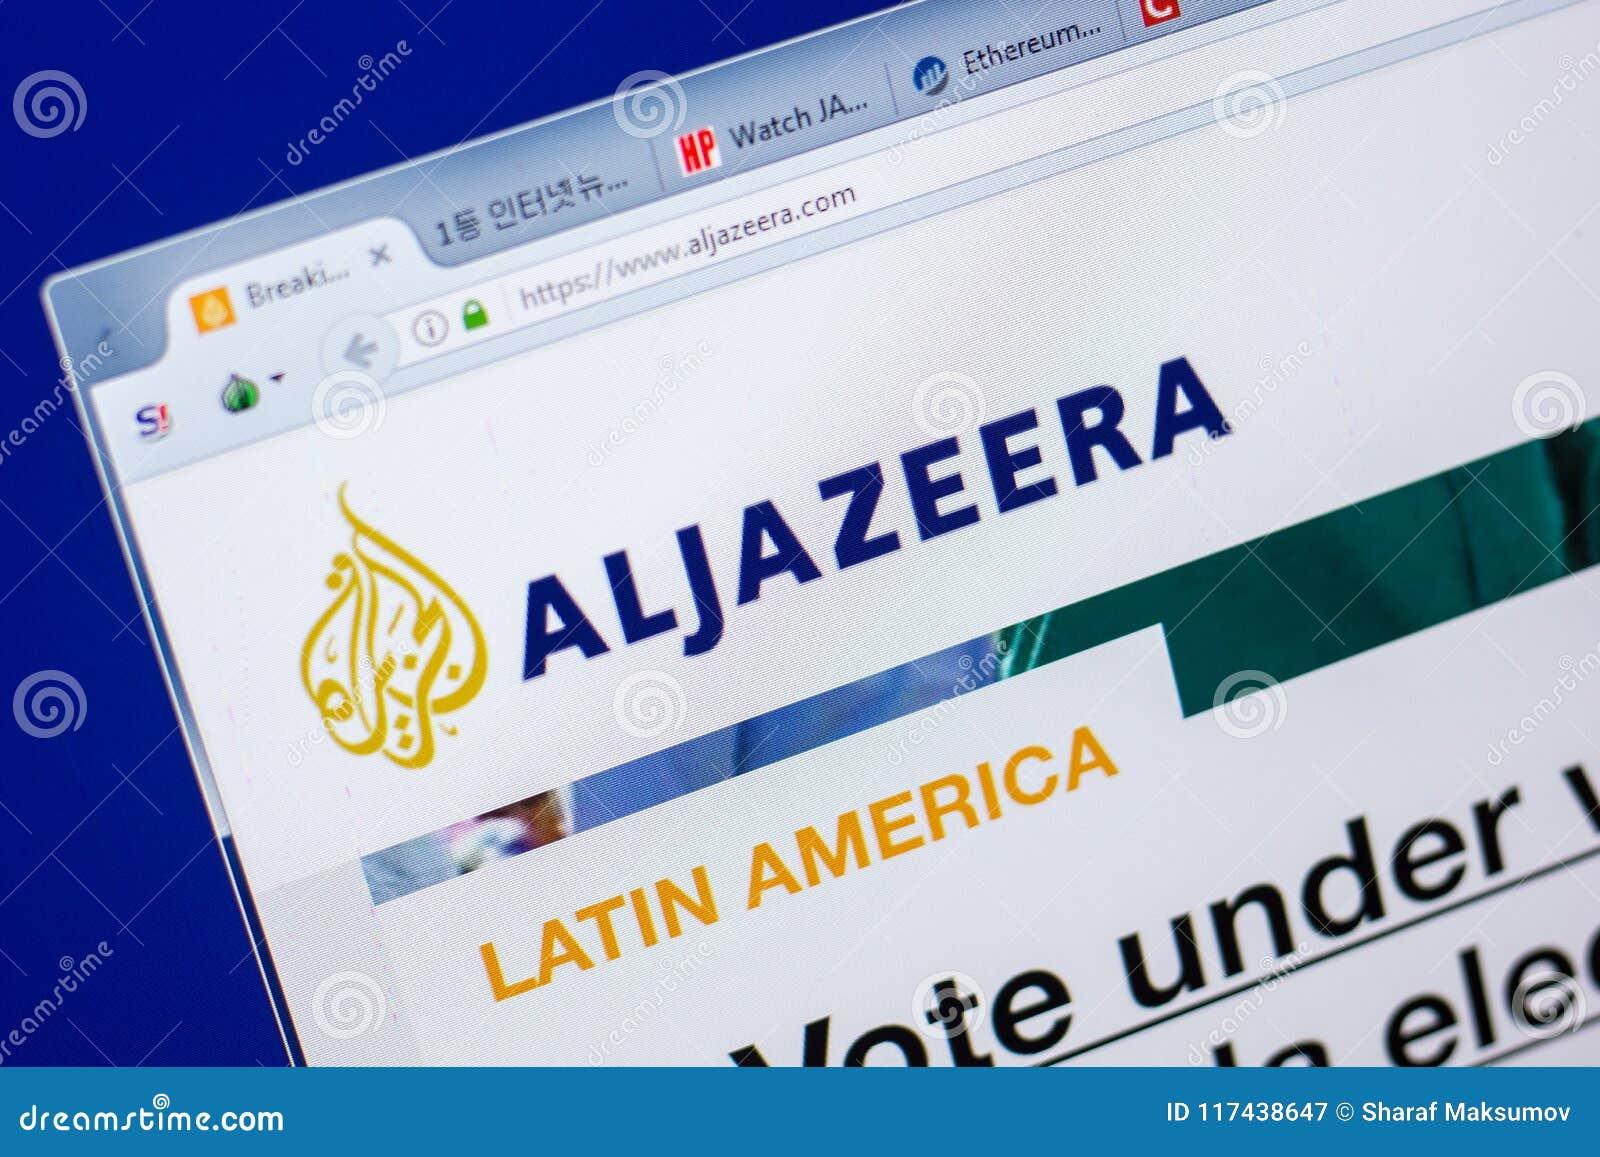 Ryazan, Russia - May 20, 2018: Homepage of Aljazeera website on the display of PC, url - Aljazeera.com.